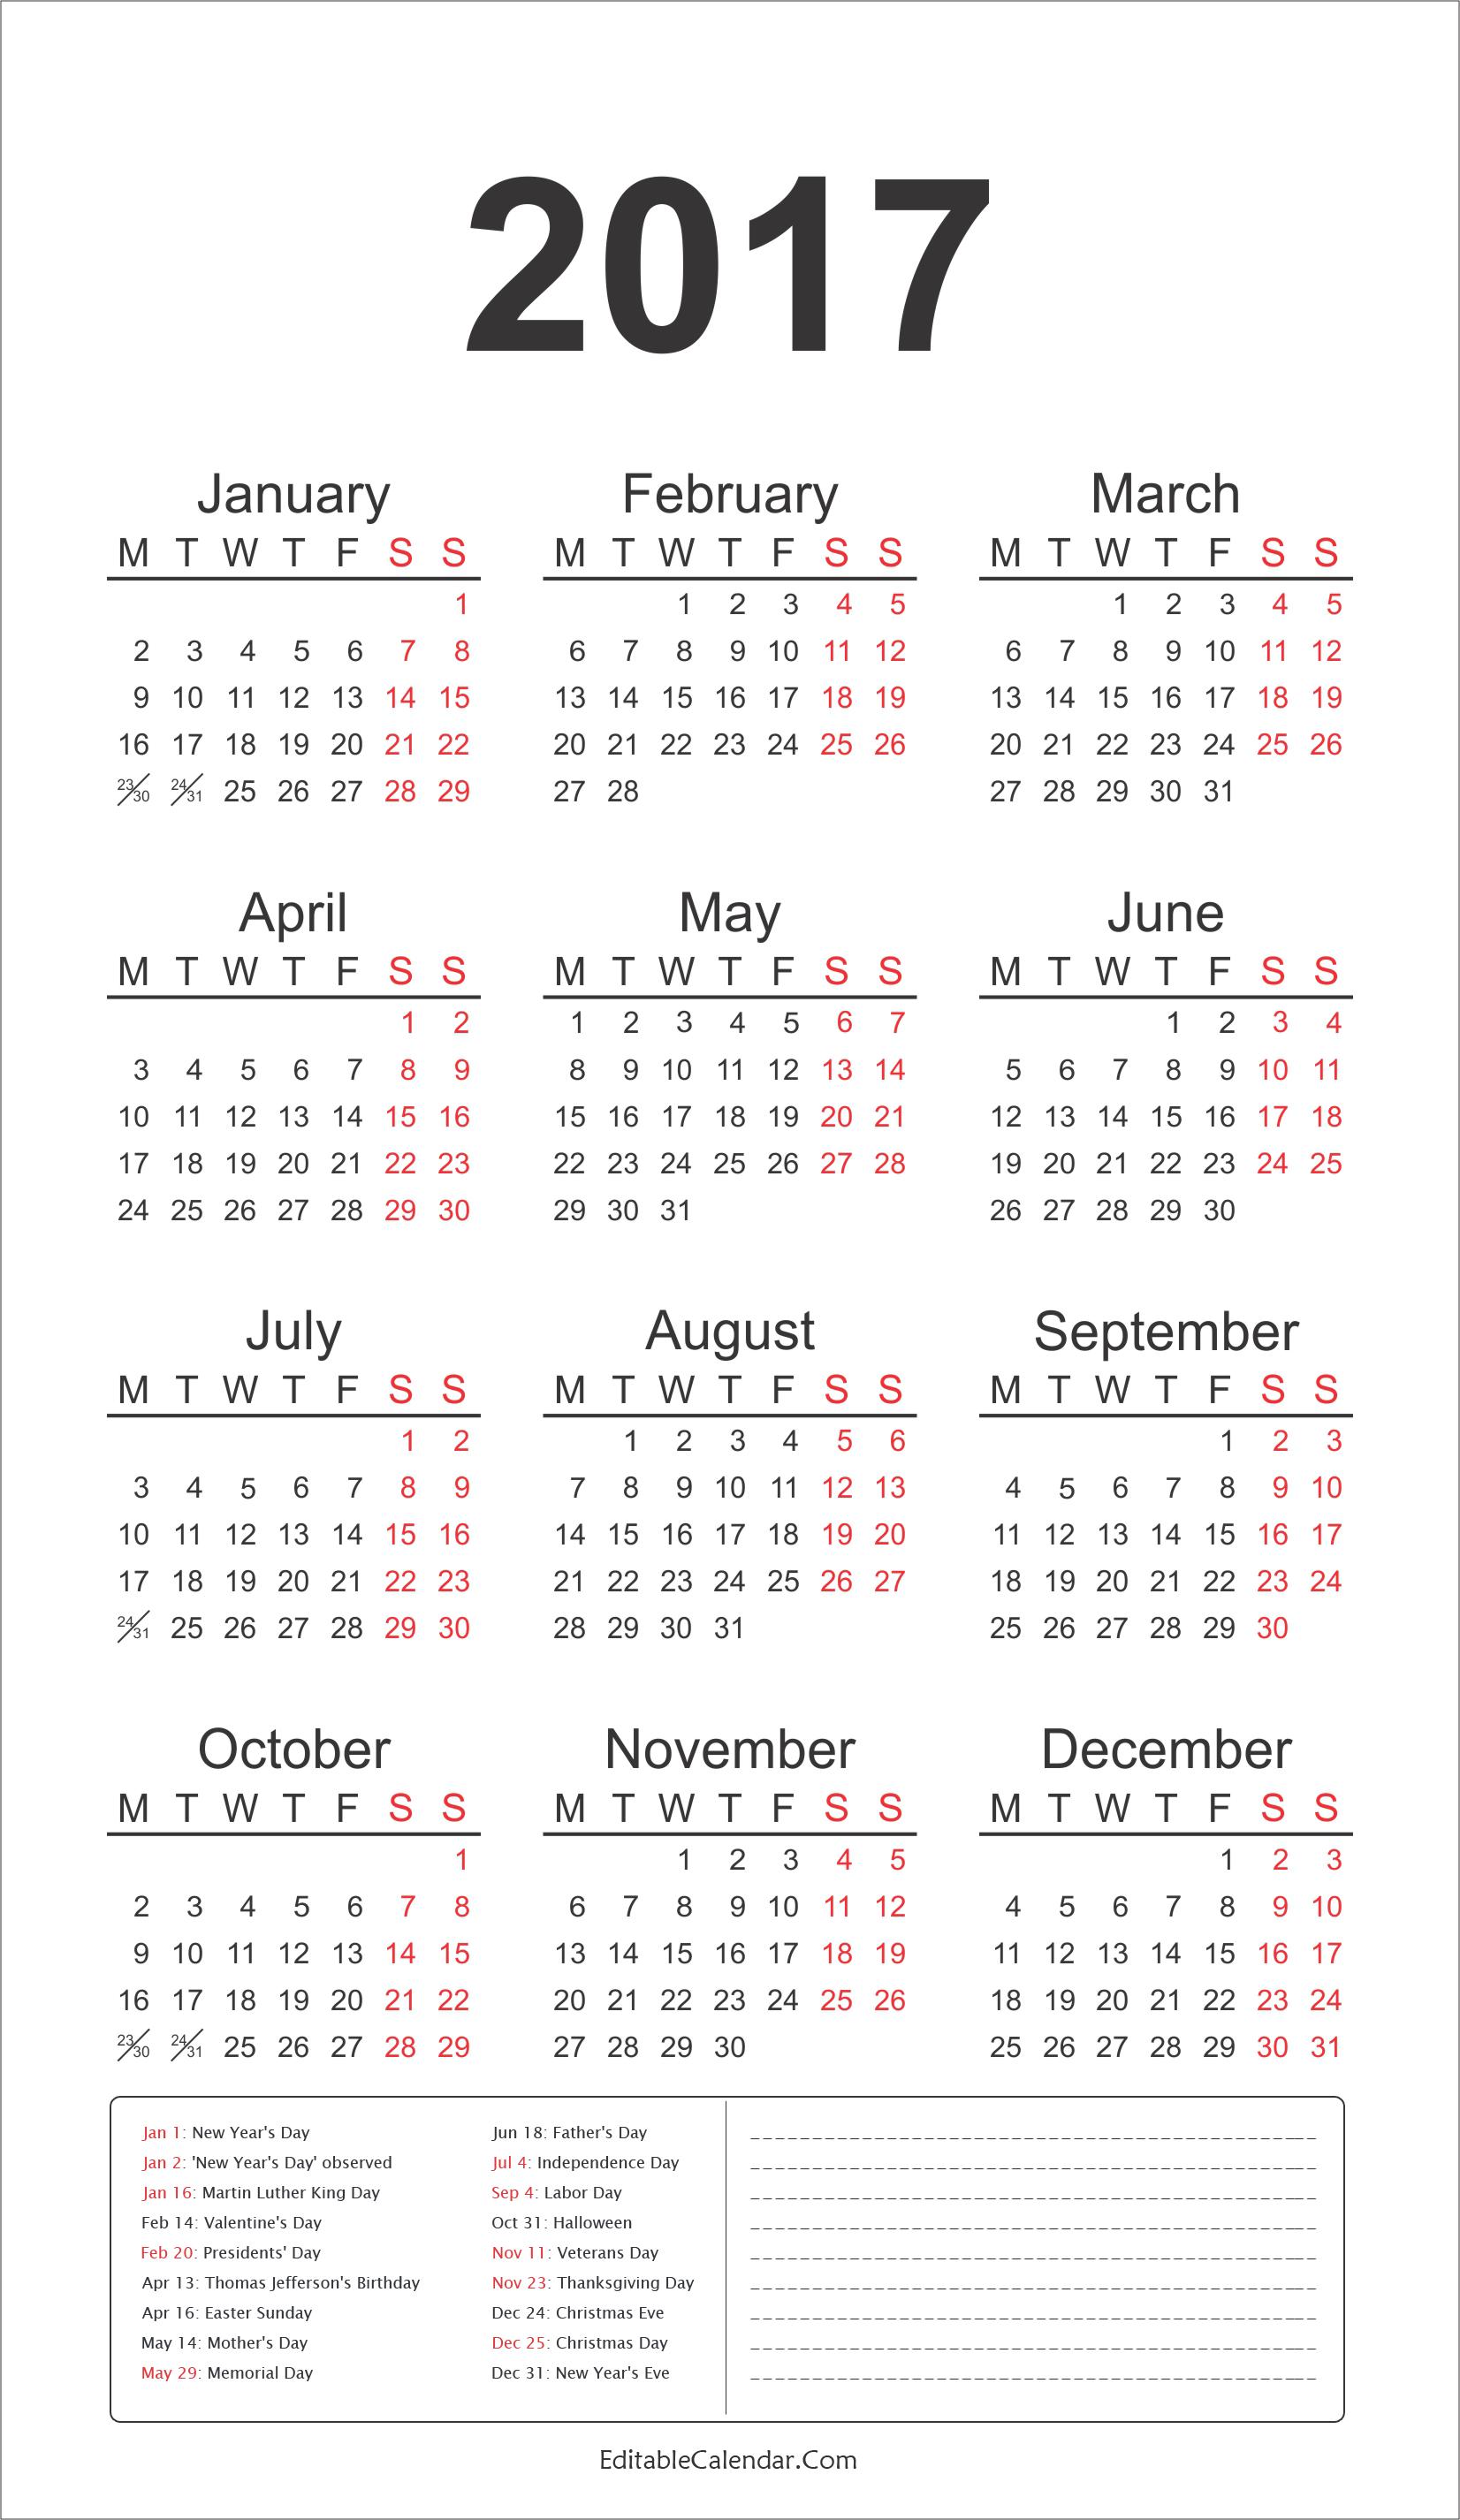 2017 16 year calendar